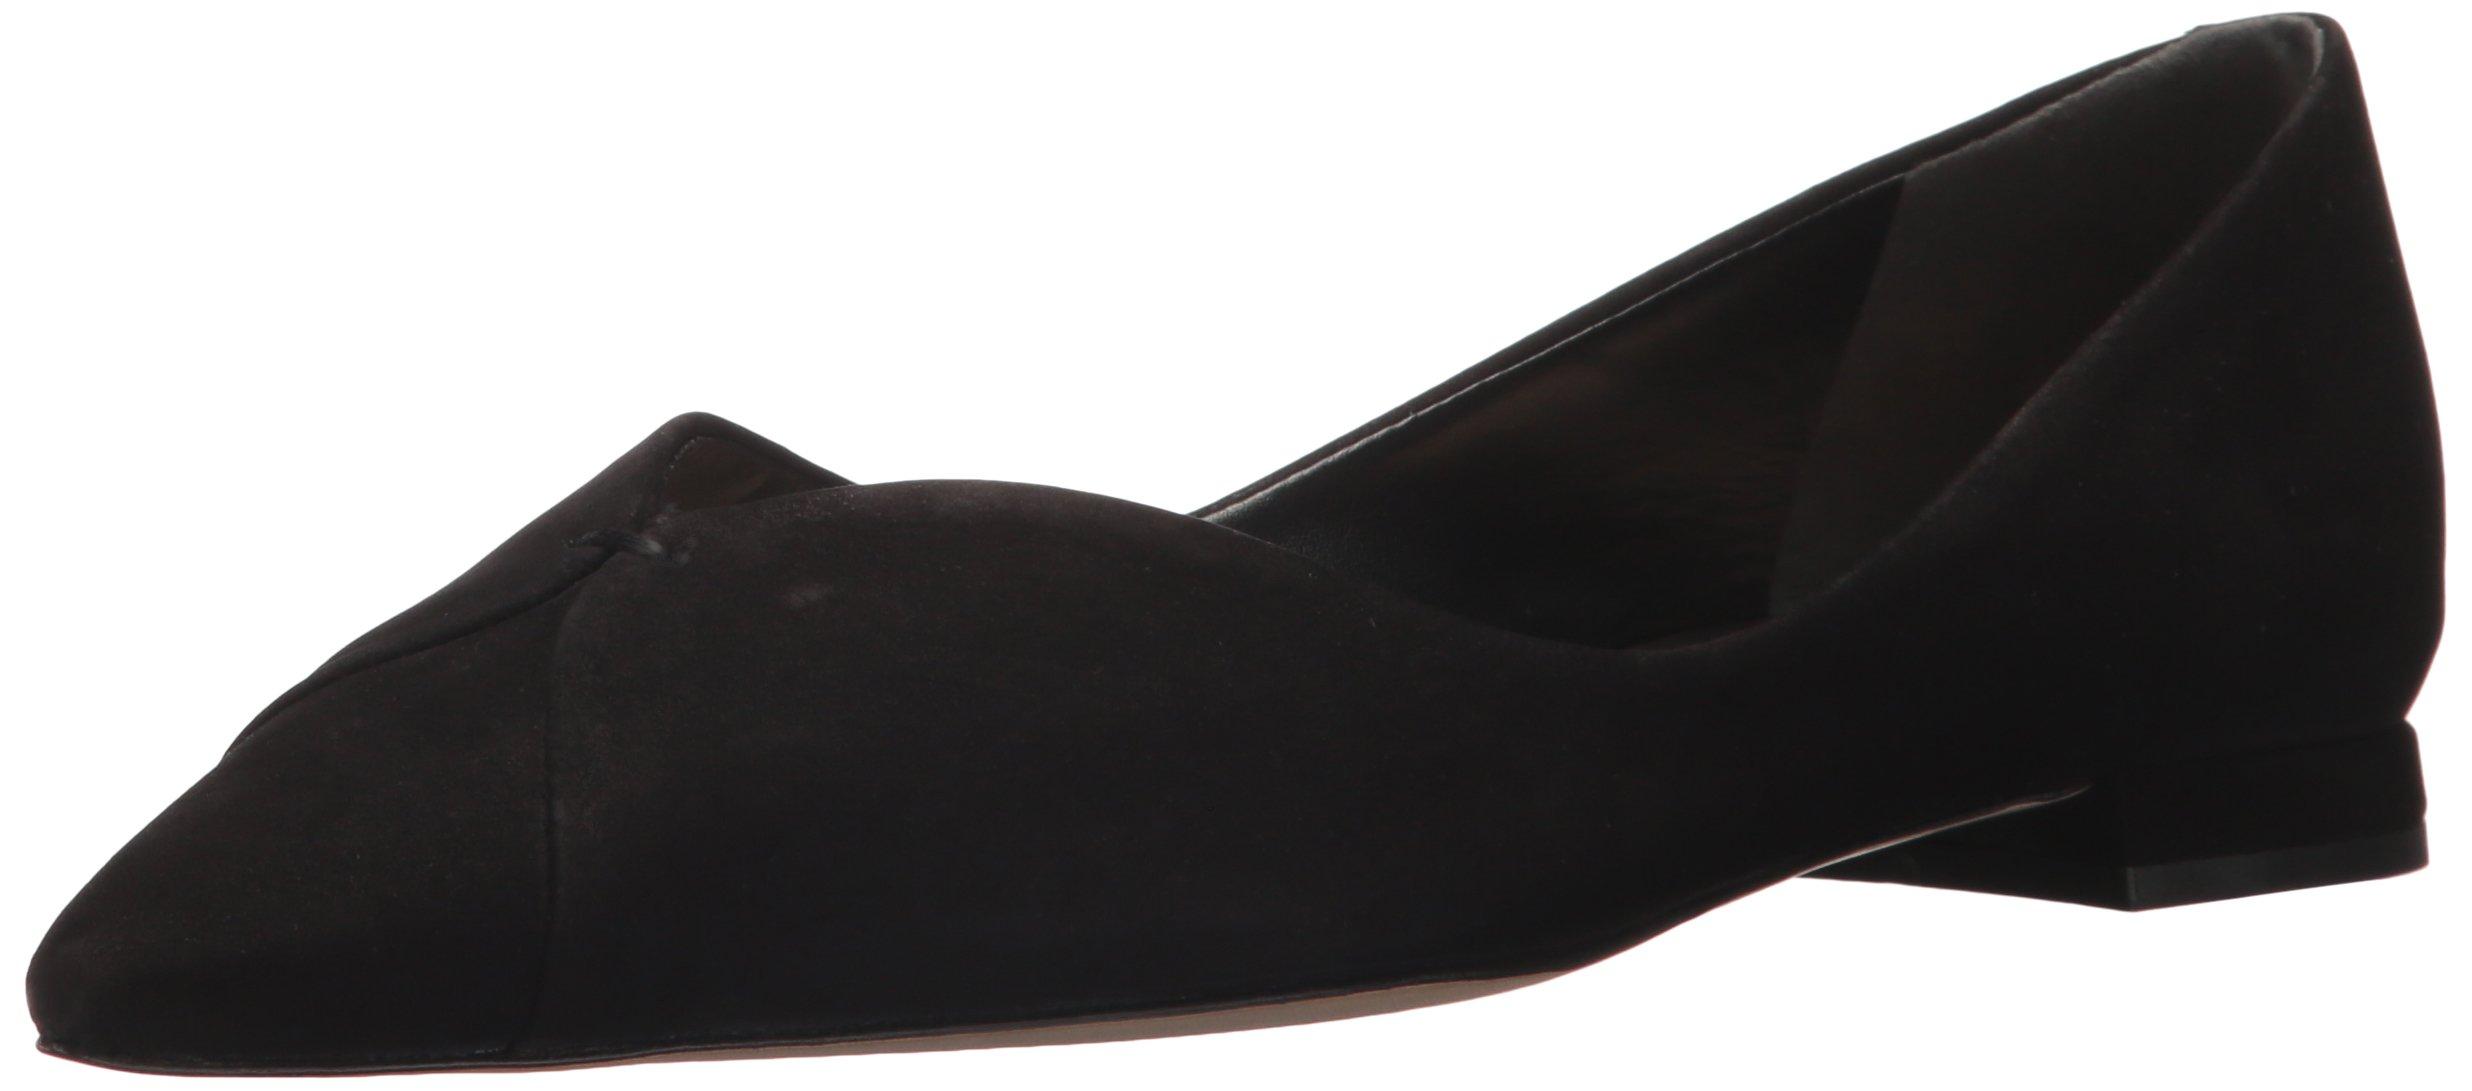 SCHUTZ Women's Sasha Ballet Flat, Black, 9.5 M US